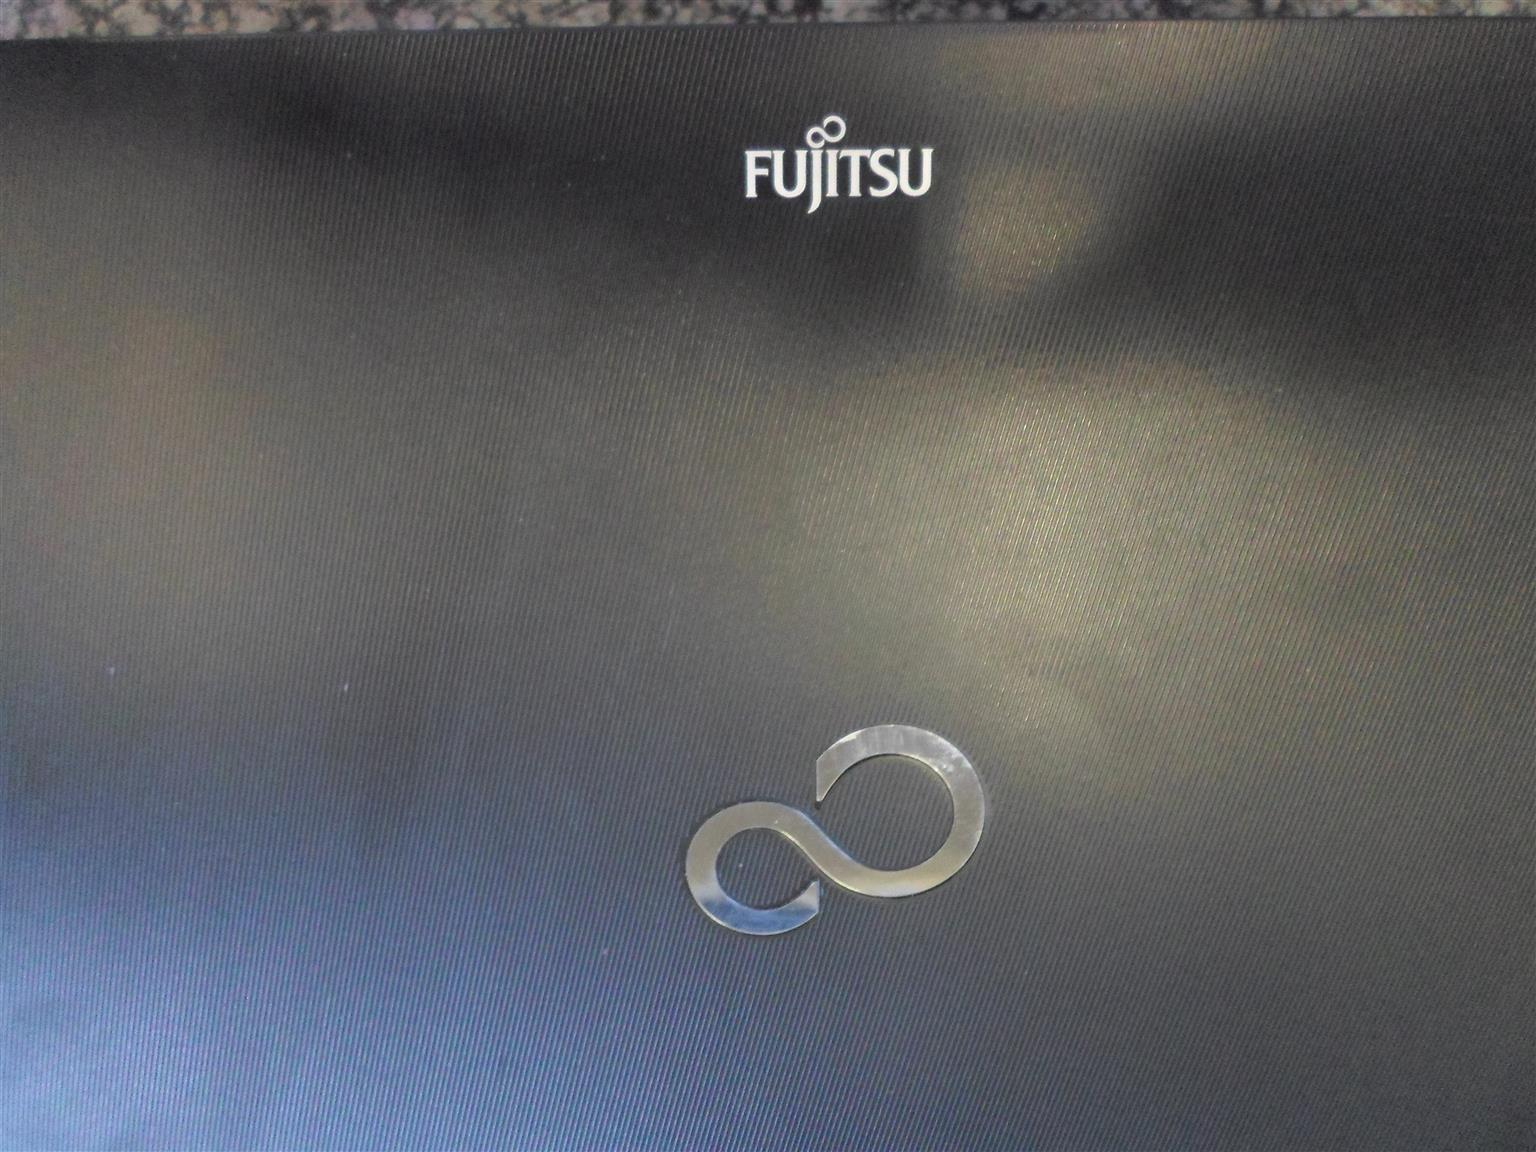 Windowa 10 Fujitsu Laptop